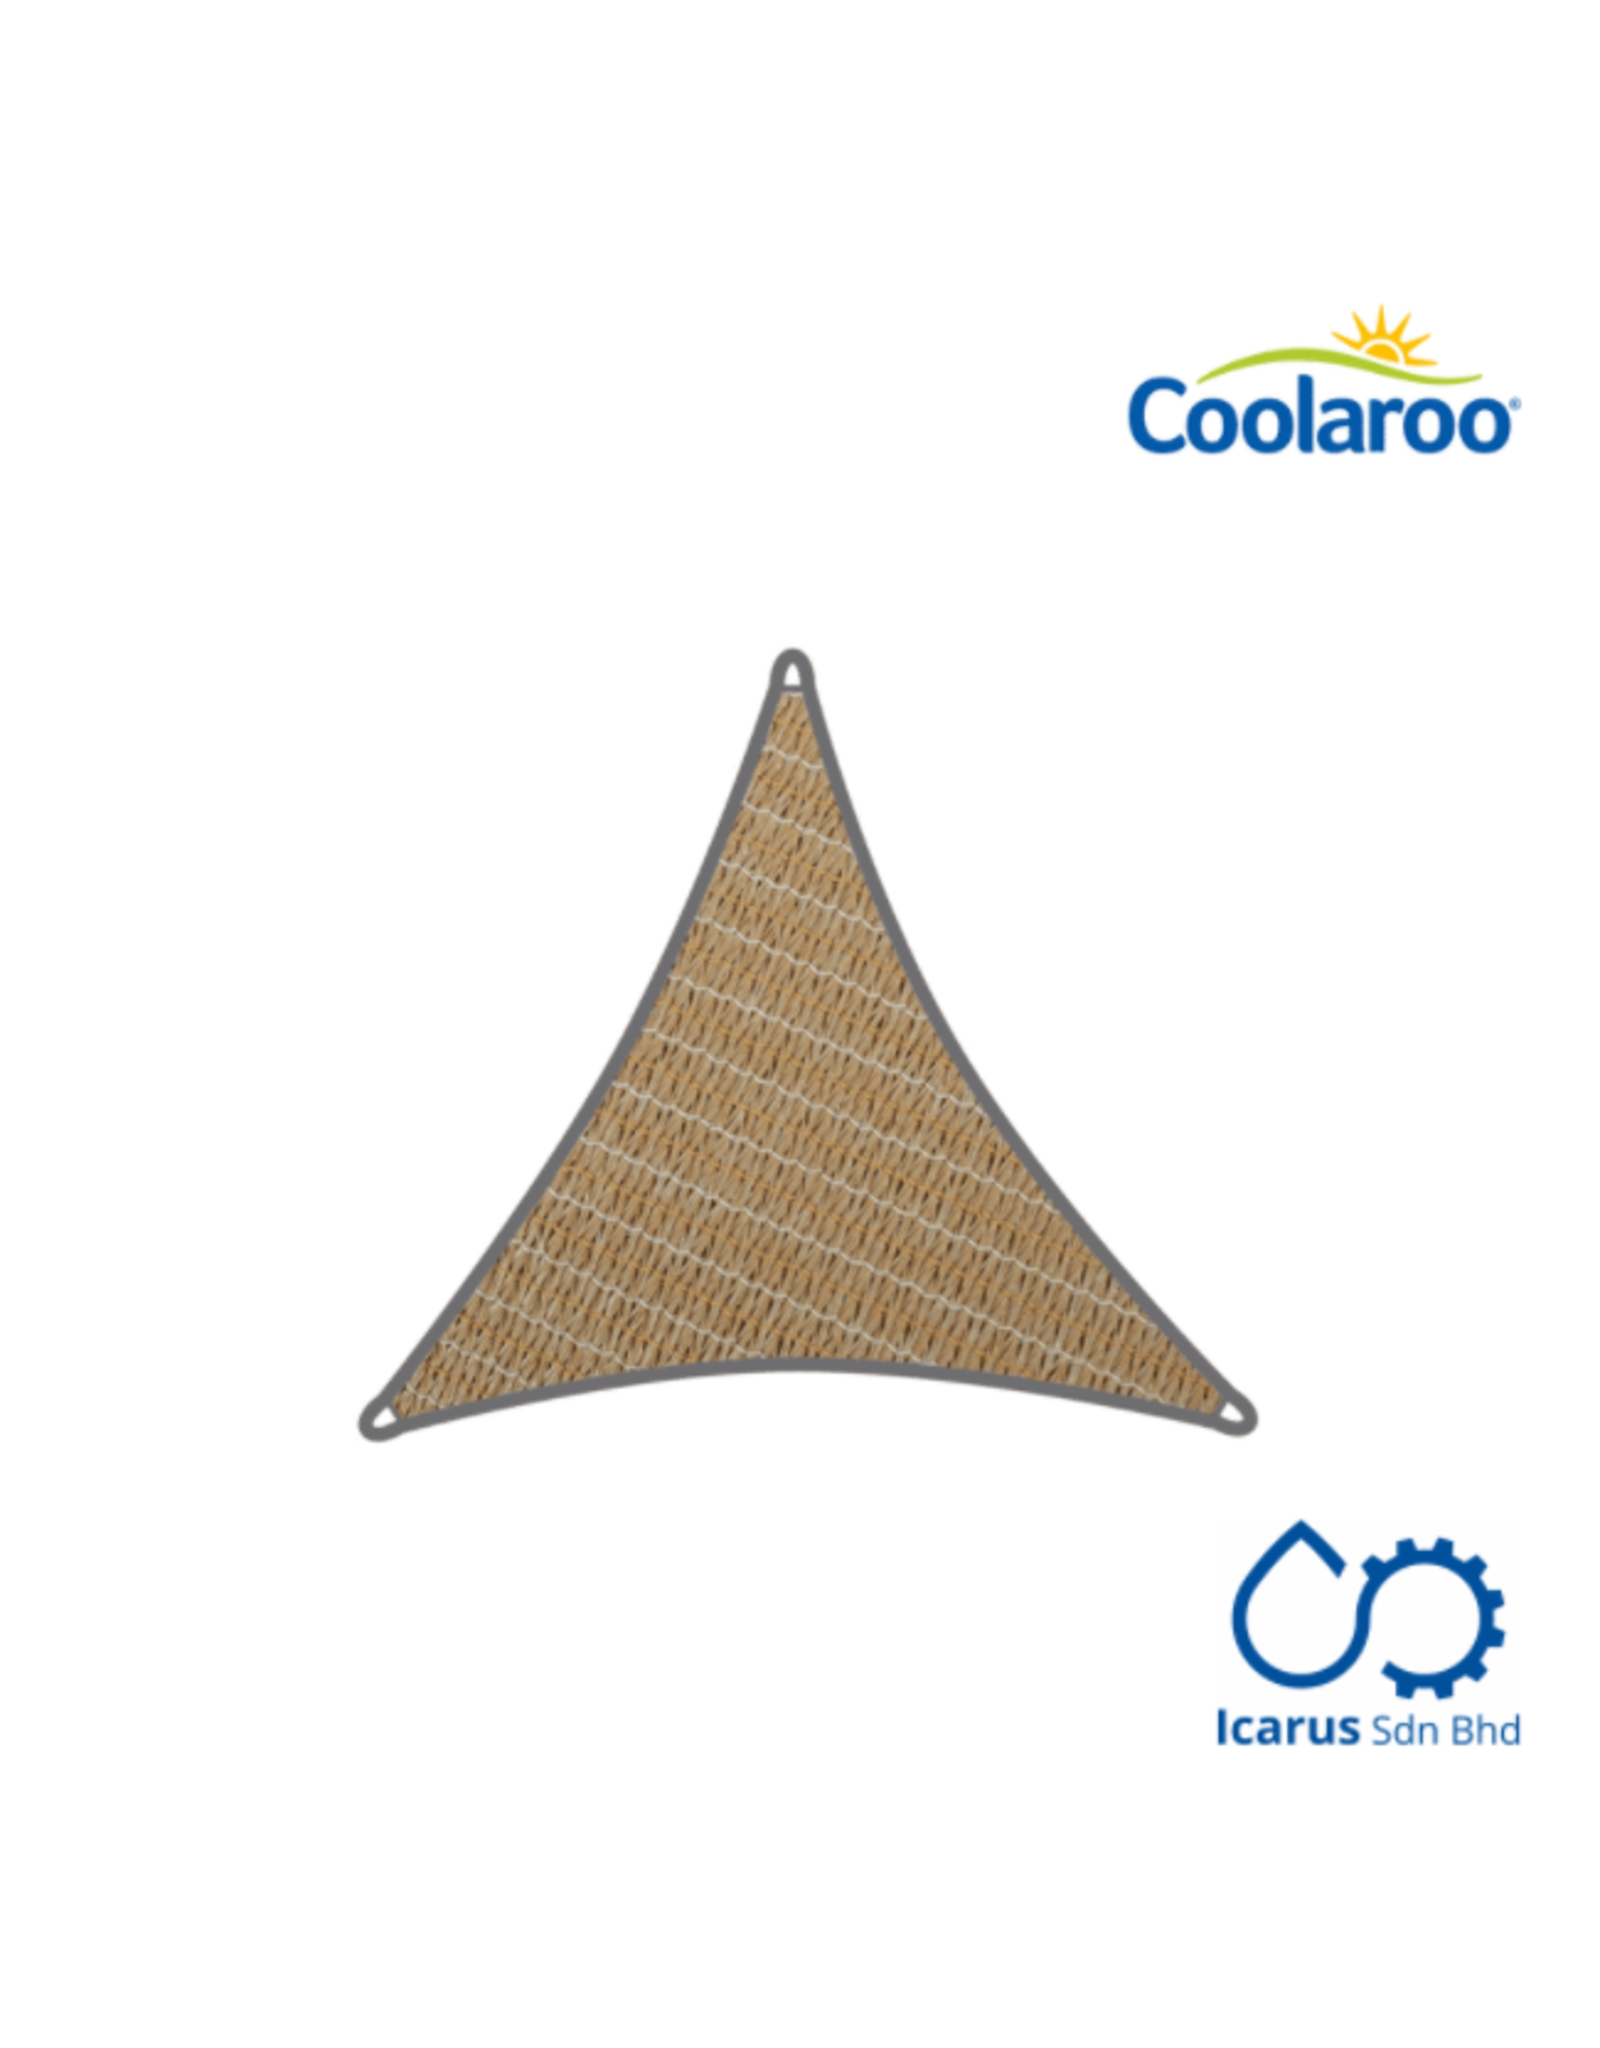 Coolaroo Commercial Grade Shade Sail Triangle 6.5m, Color Beech